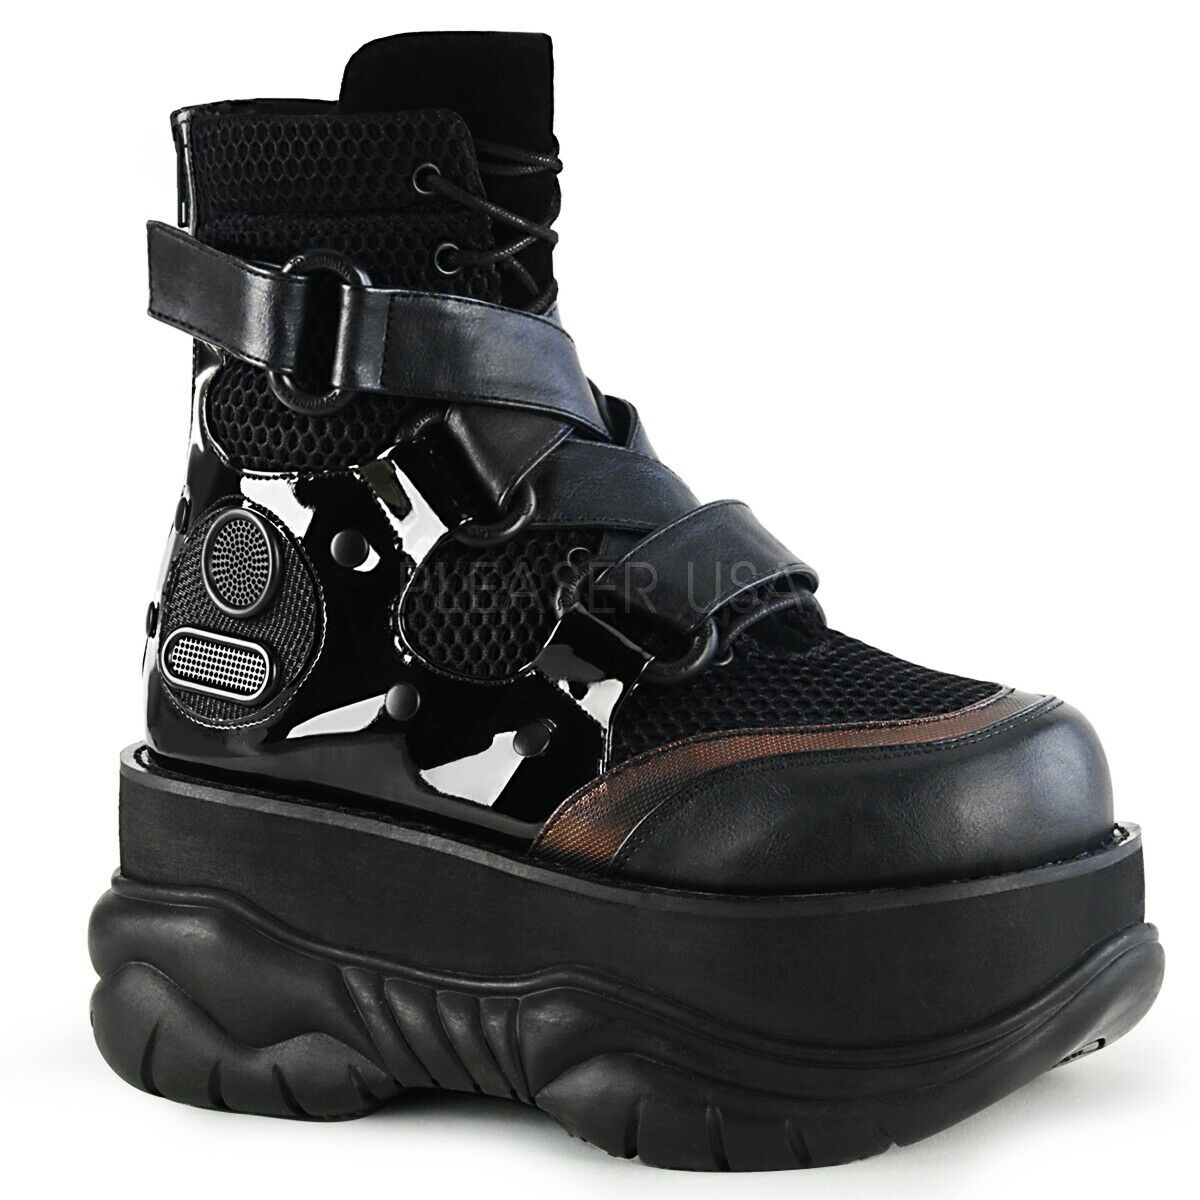 Demonia 3  Platform Black Ankle Boots shoes Gothic Cyber 5 6 7 8 9 10 11 12